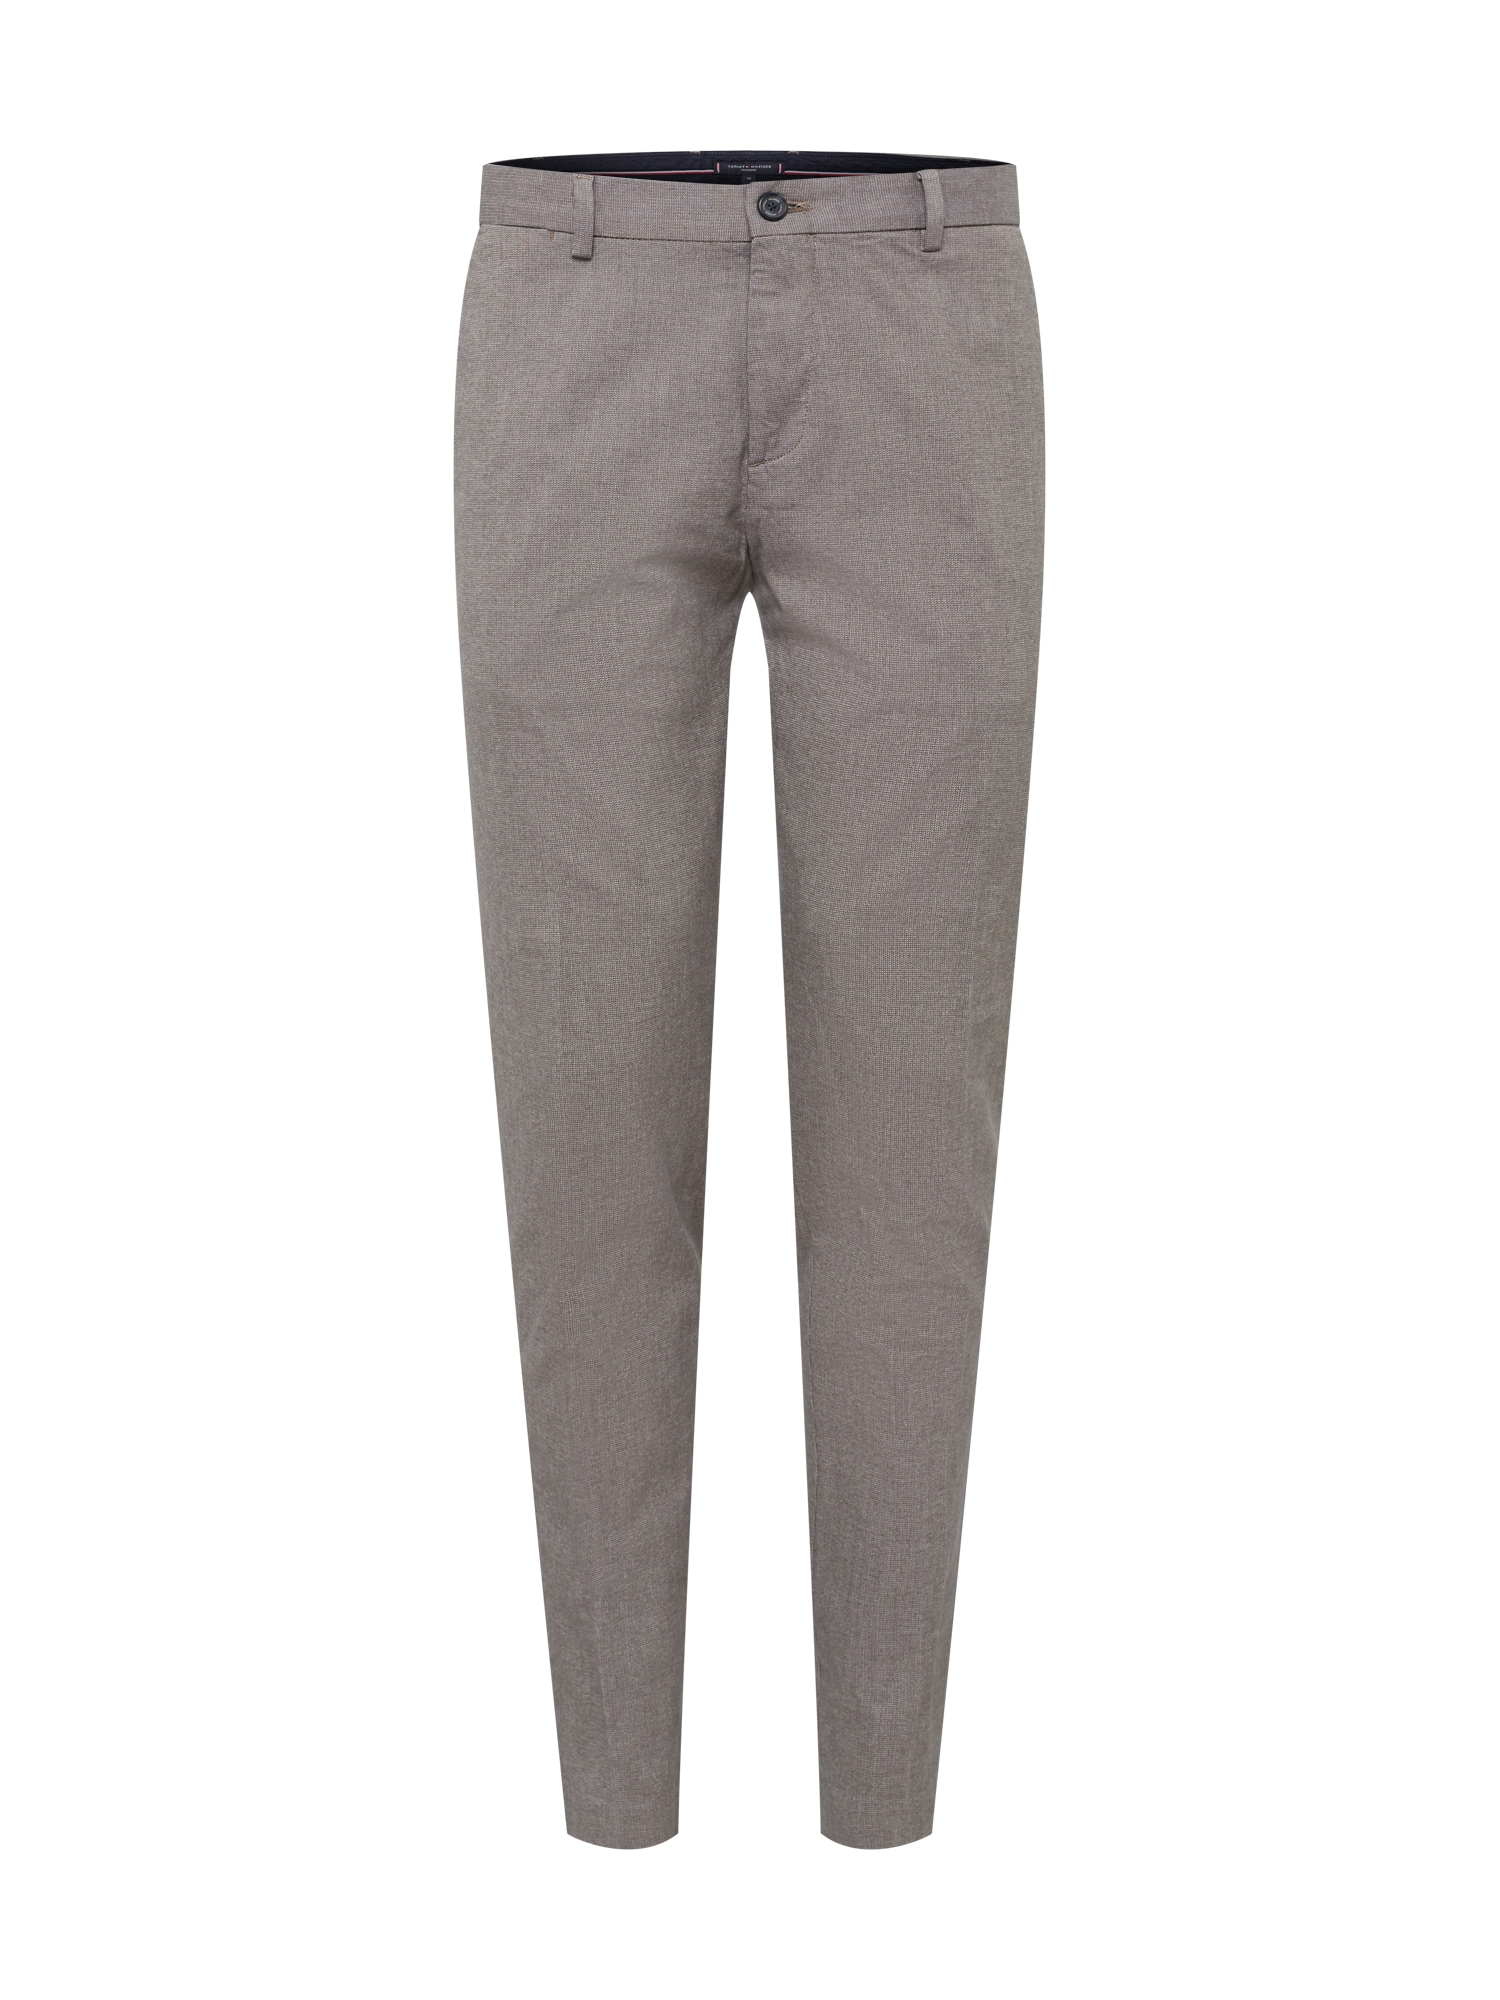 Tommy Hilfiger Tailored Kelnės rusvai pilka